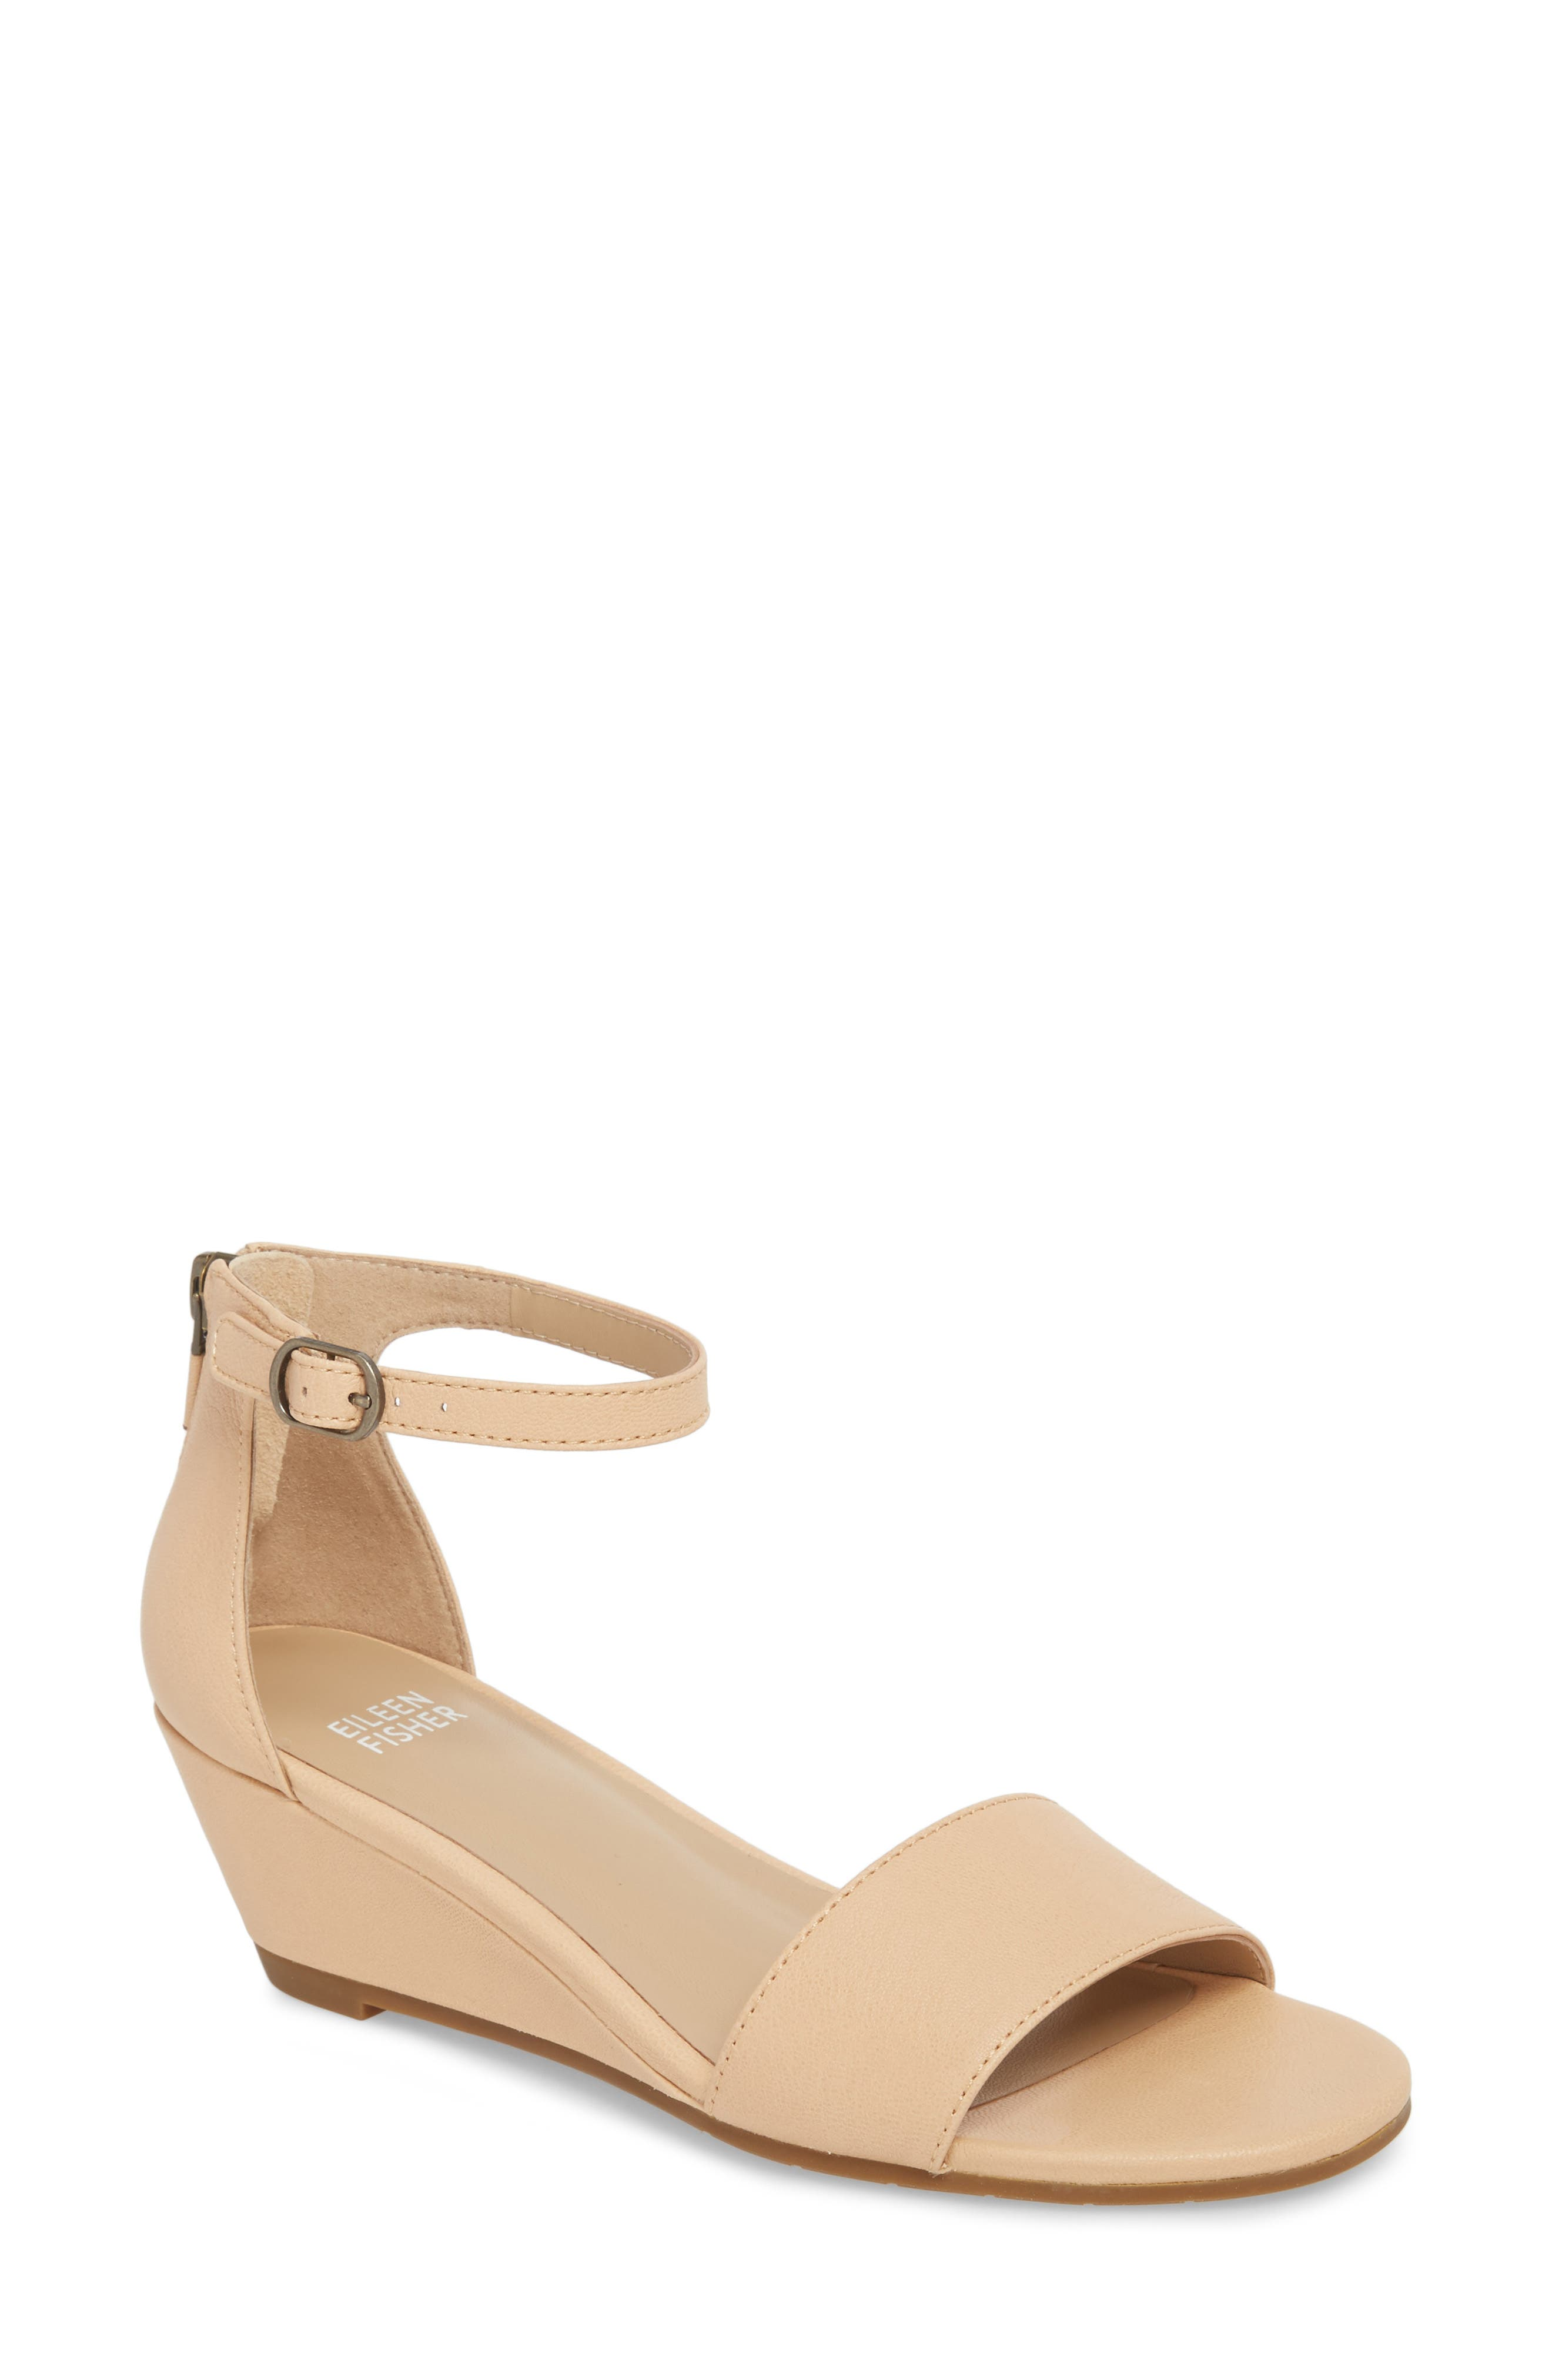 Eileen Fisher Mara Ankle Strap Wedge Sandal (Women)